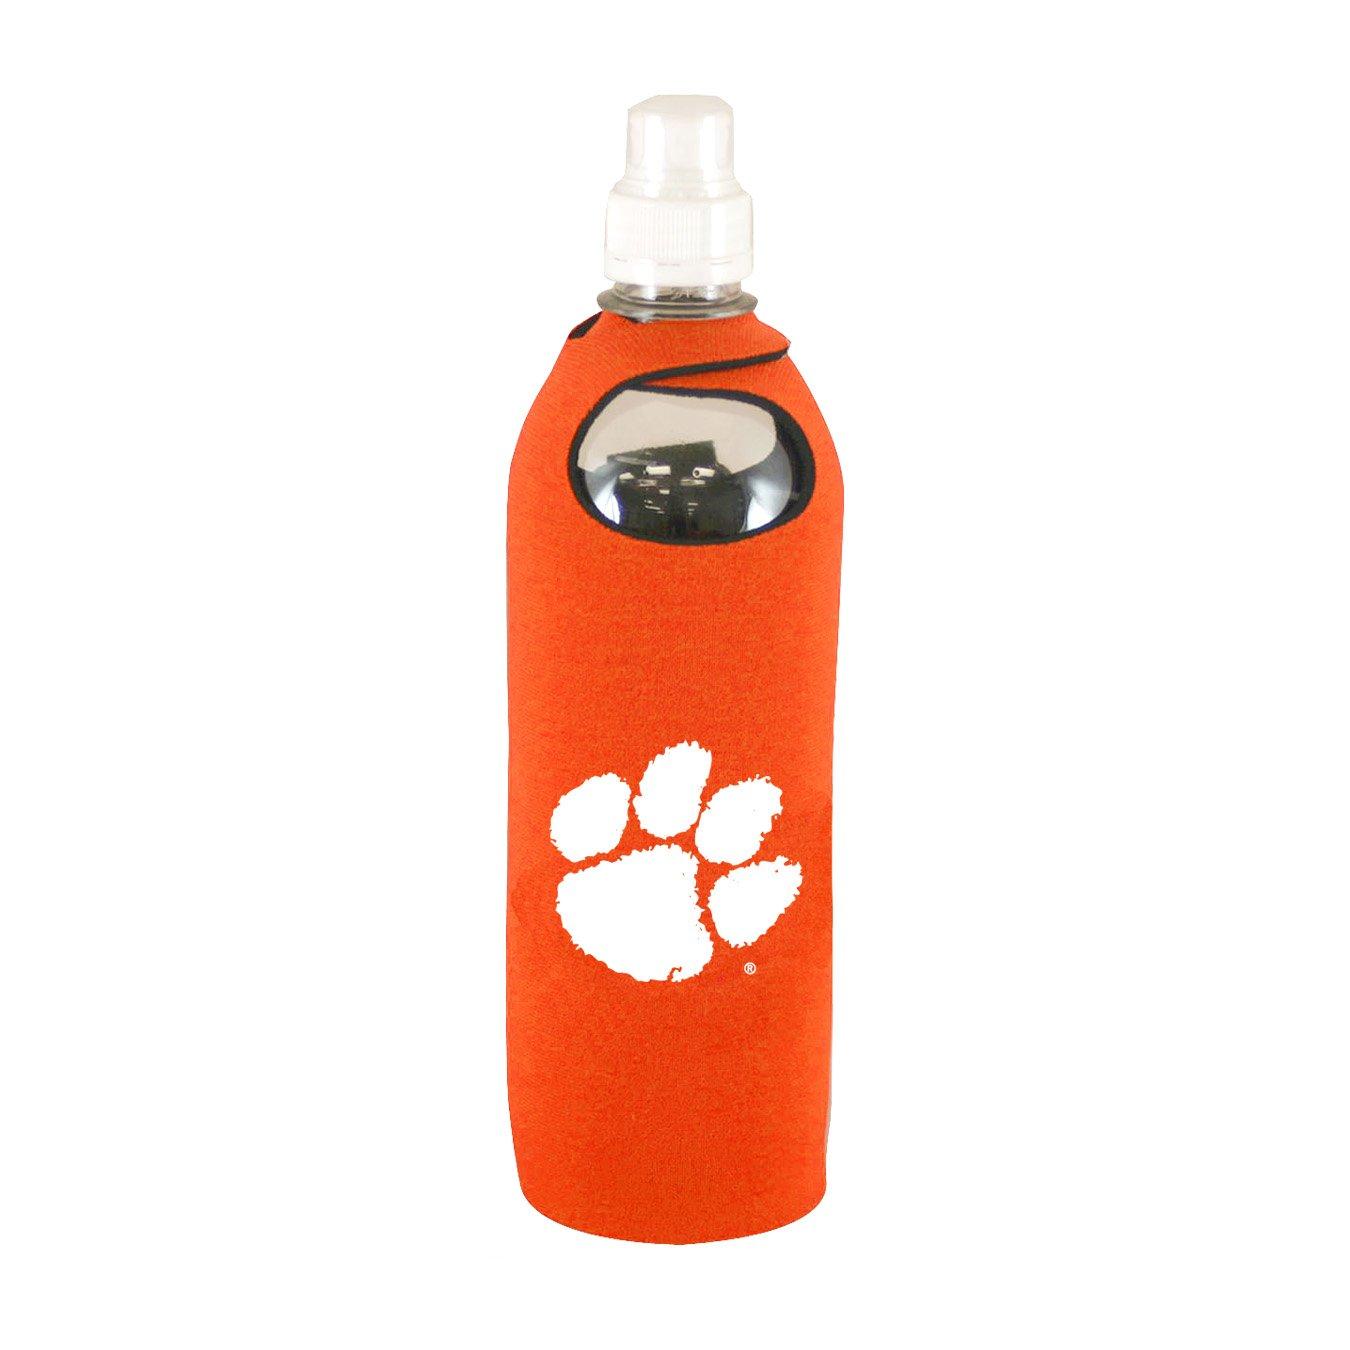 Clemson Tigers 1/2 Liter Water Soda Bottle Koozie Holder Cooler with Clip University of Kolder